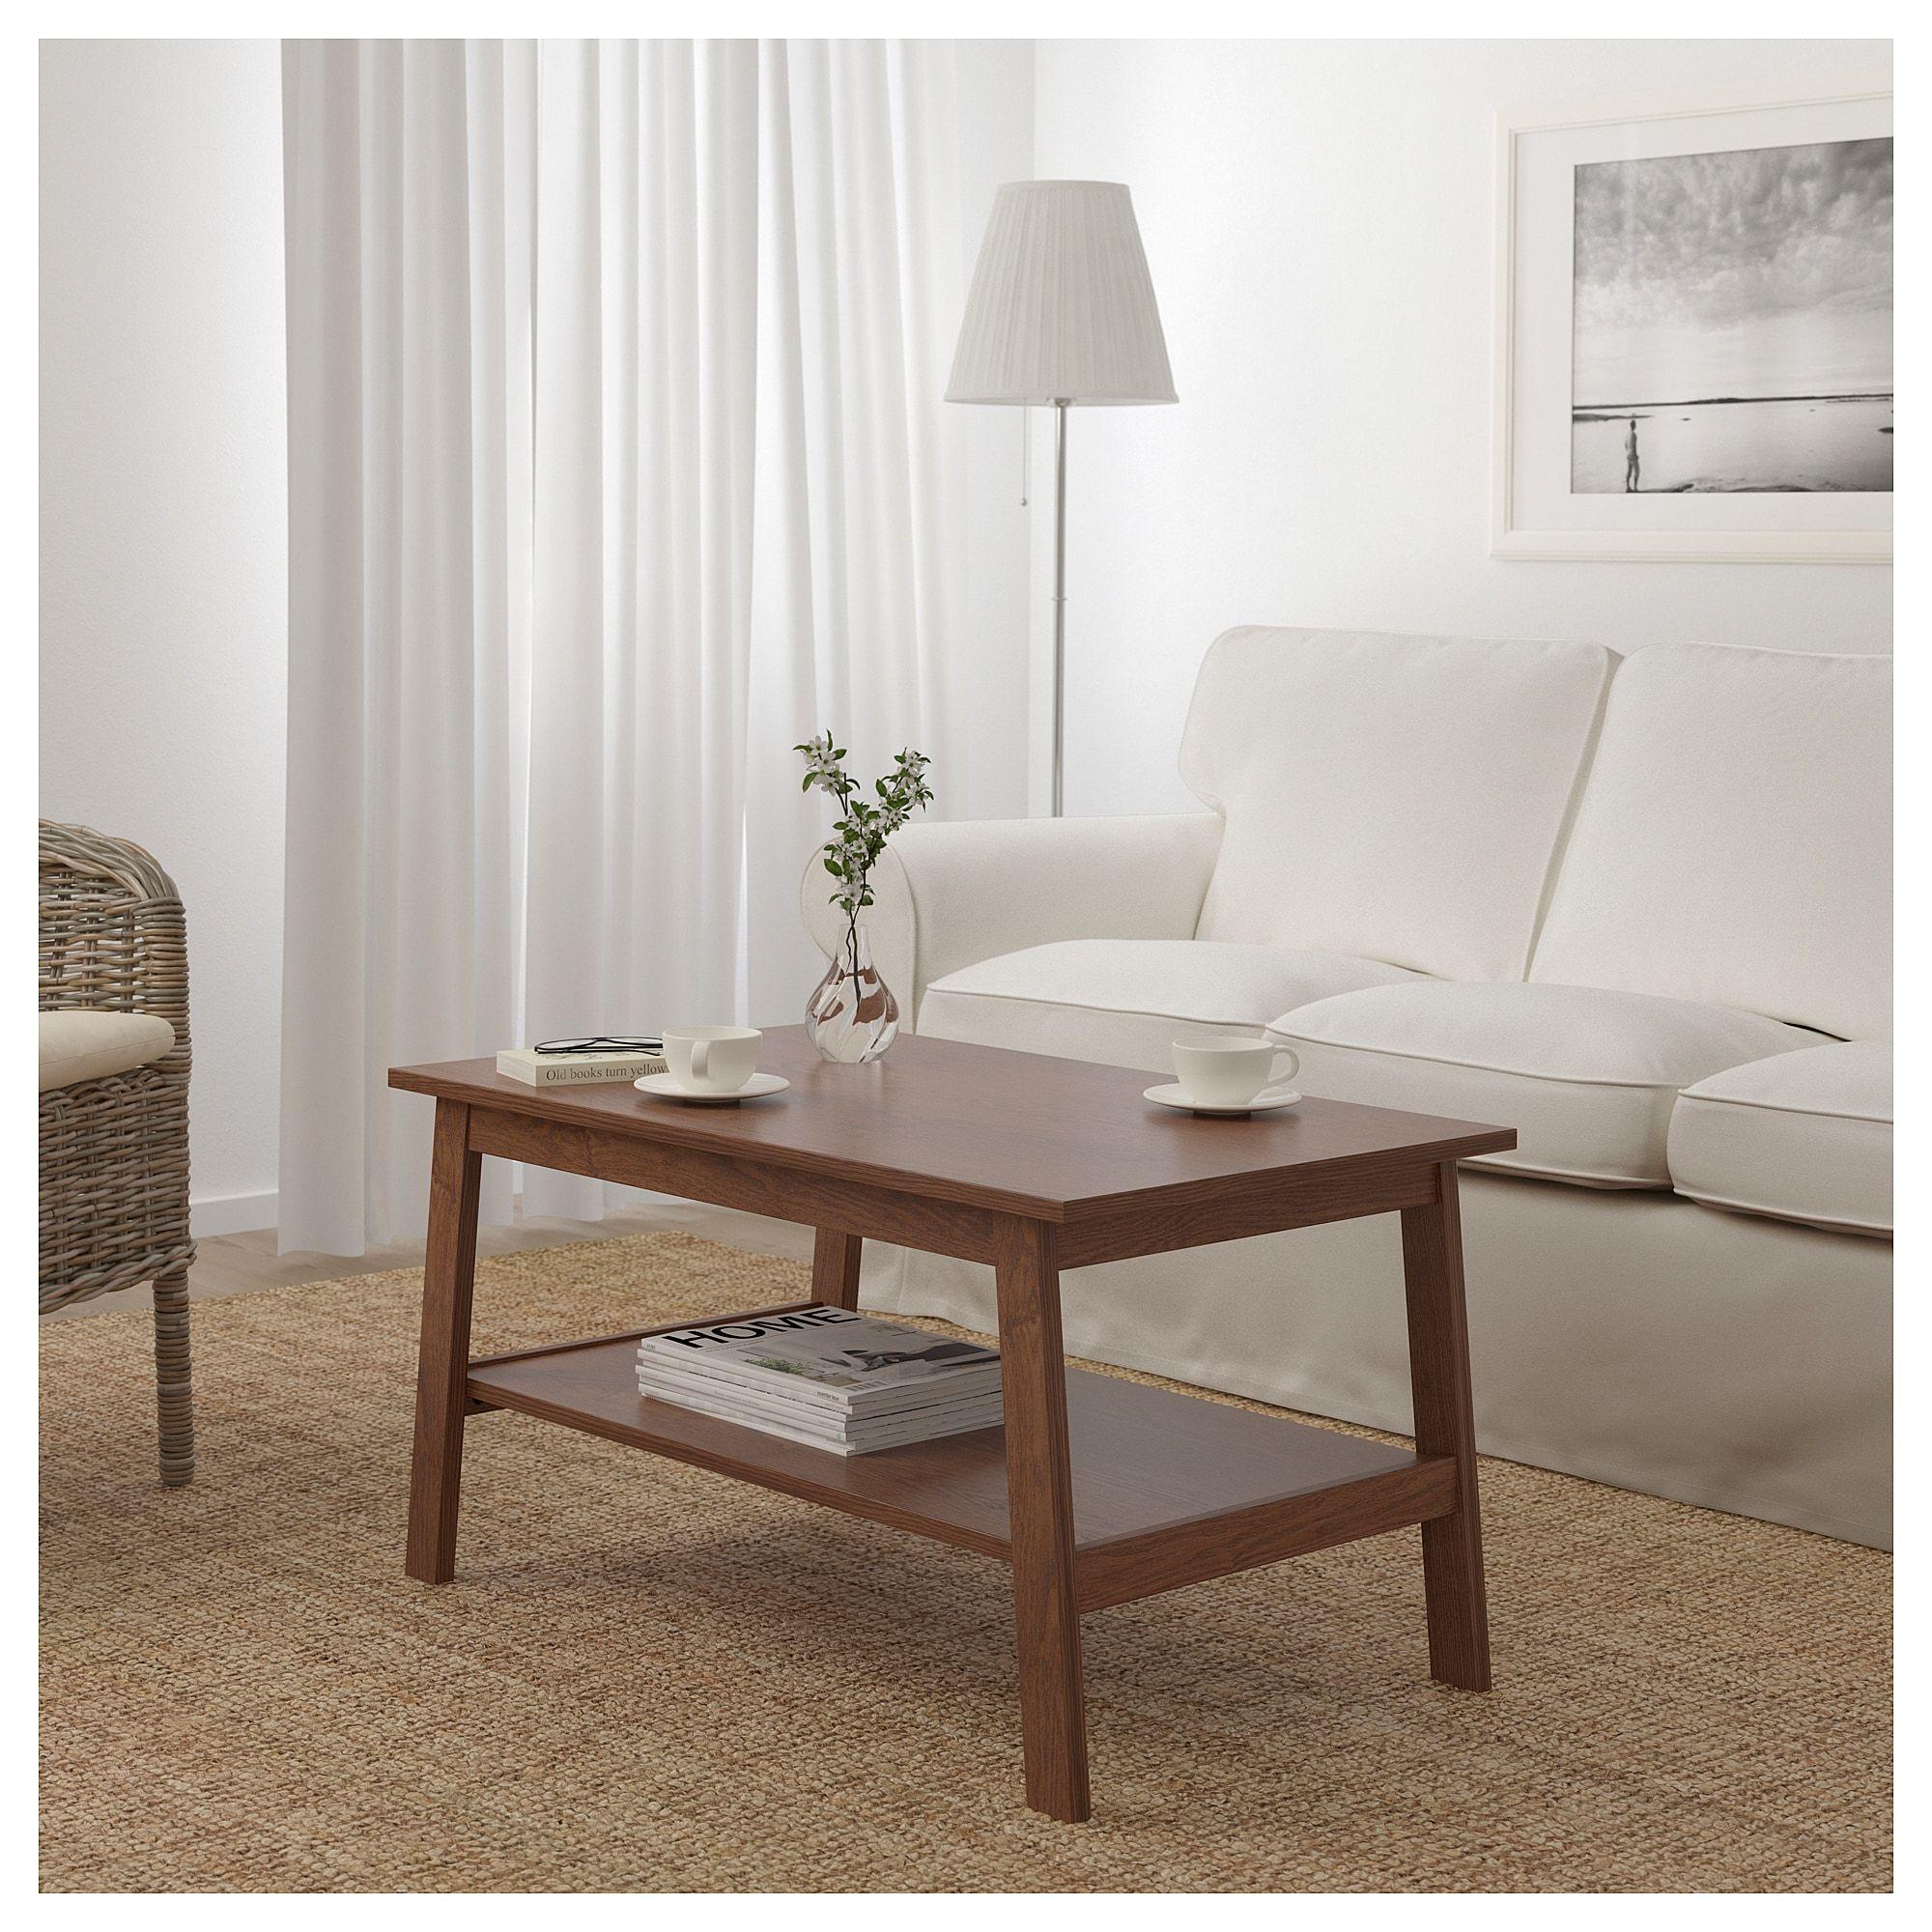 Ikea Tavolino Lack Bianco.Lunnarp Tavolino Bianco In 2019 Ikea Coffee Table Lack